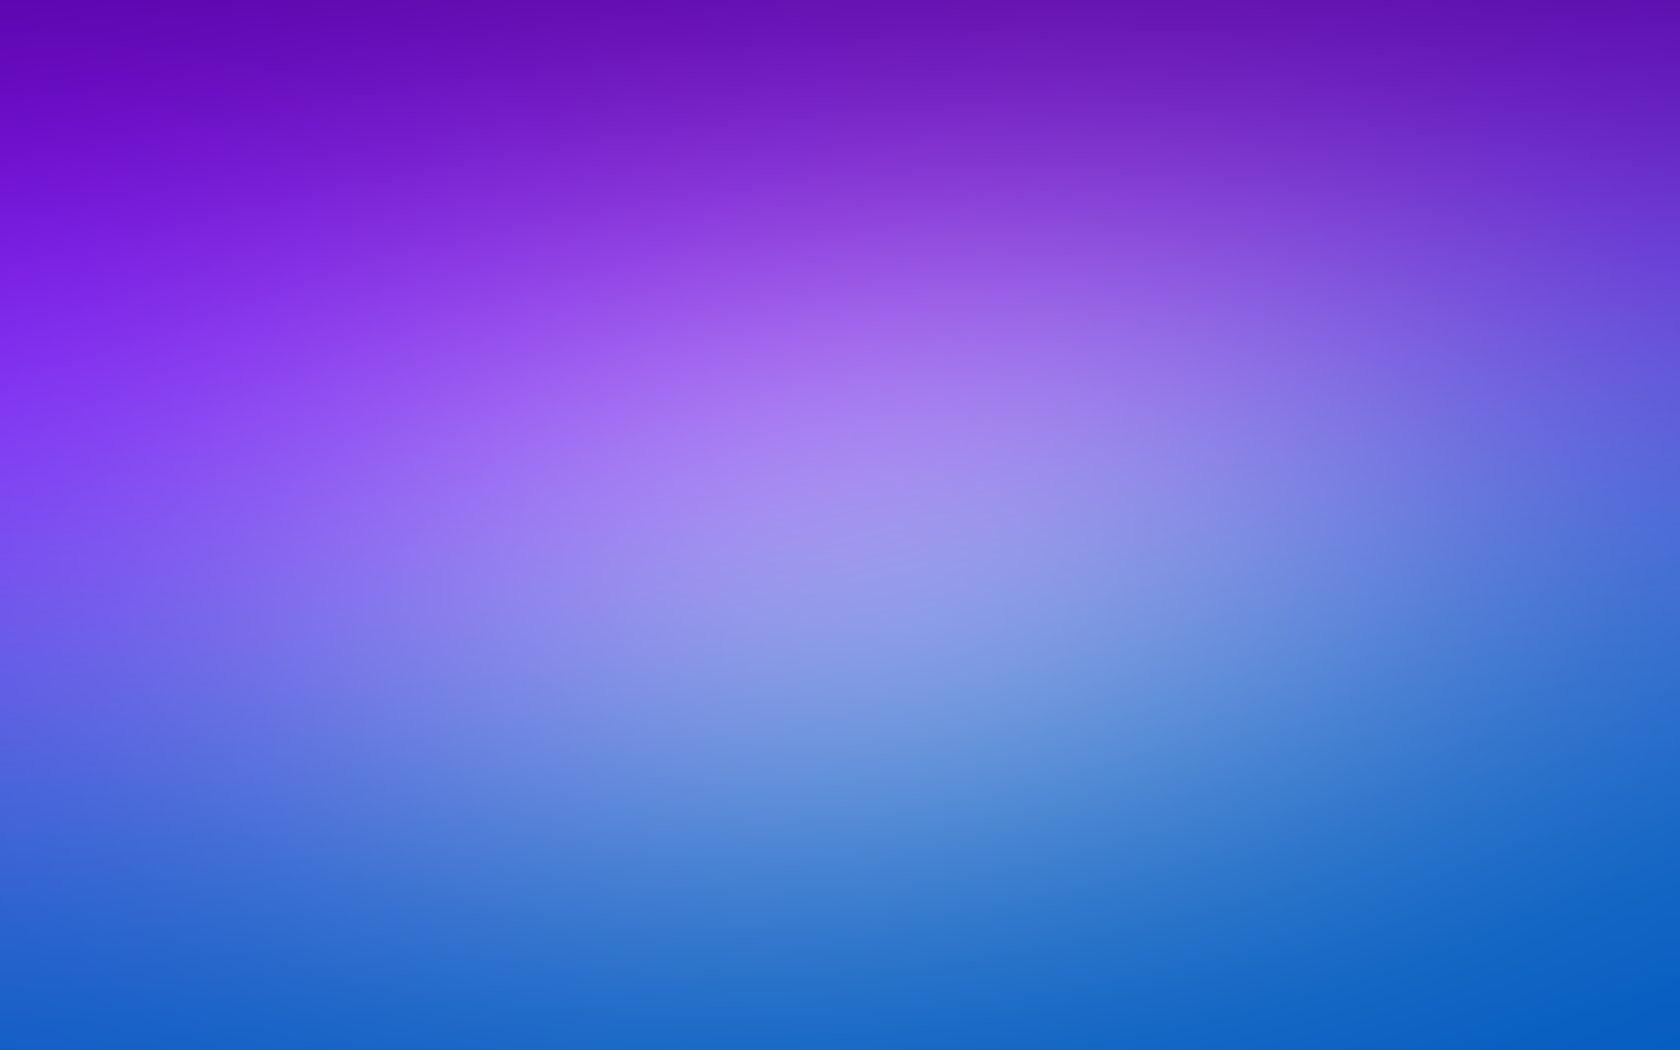 Full Hd Simple Background 1680x1050 Download Hd Wallpaper Wallpapertip